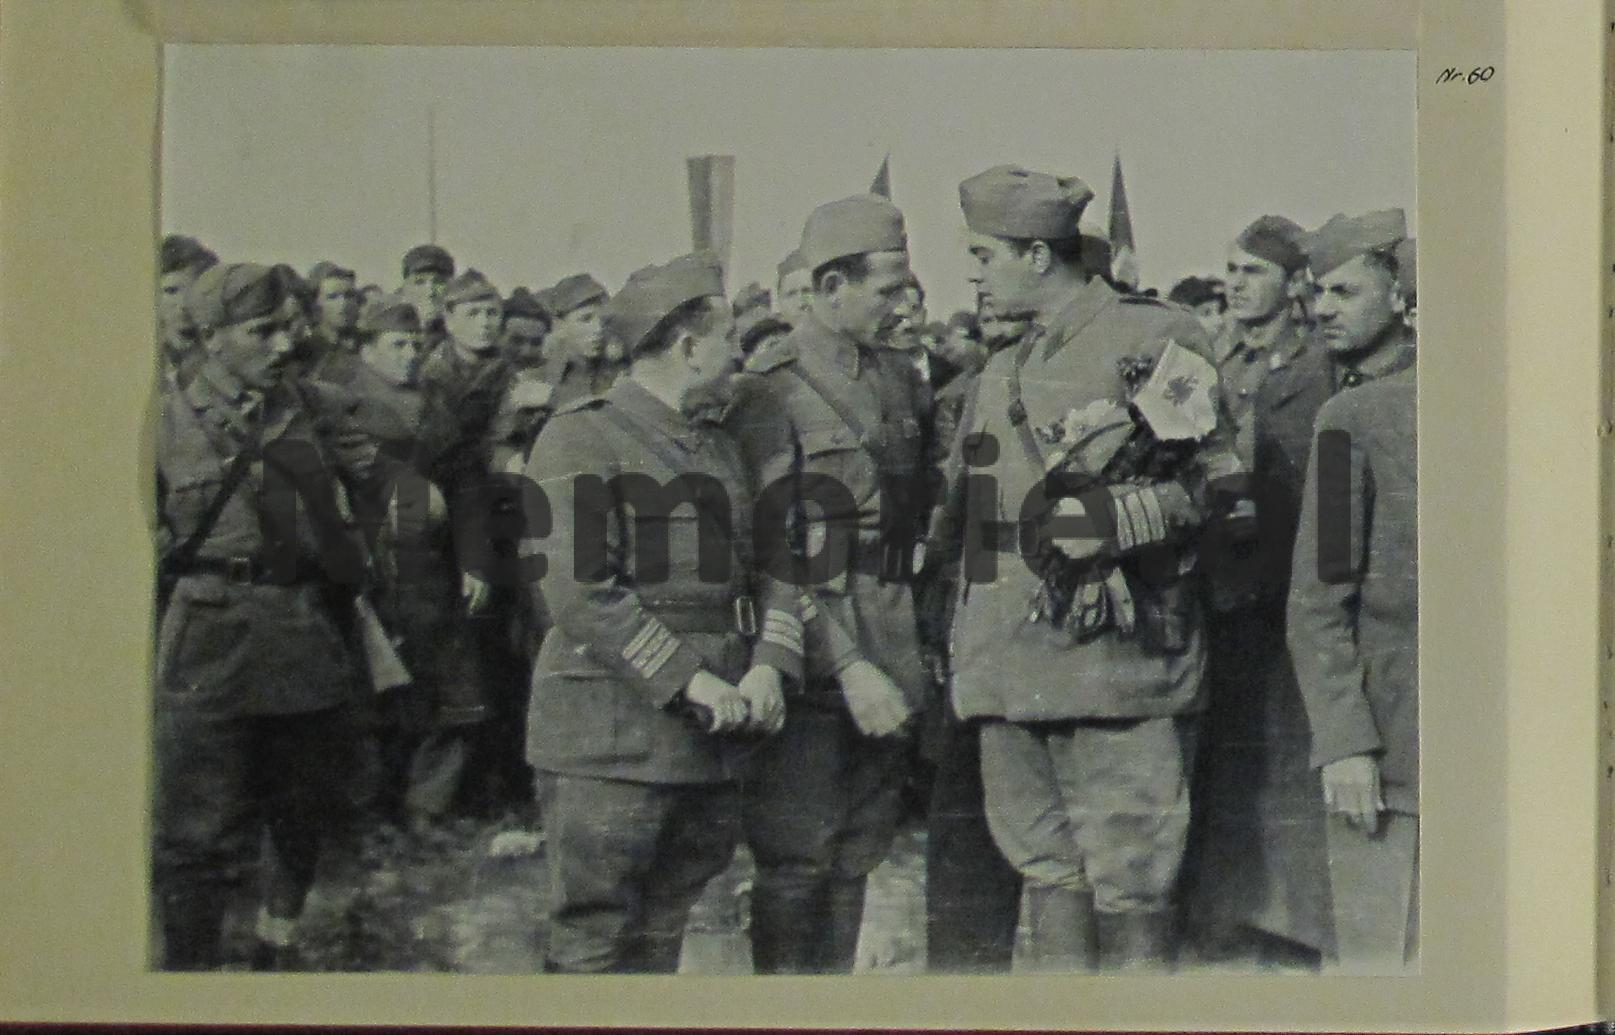 partizanet-hyjne-ne-tirana-e-vjeter-enver-hoxha-mehmet-shehu-5